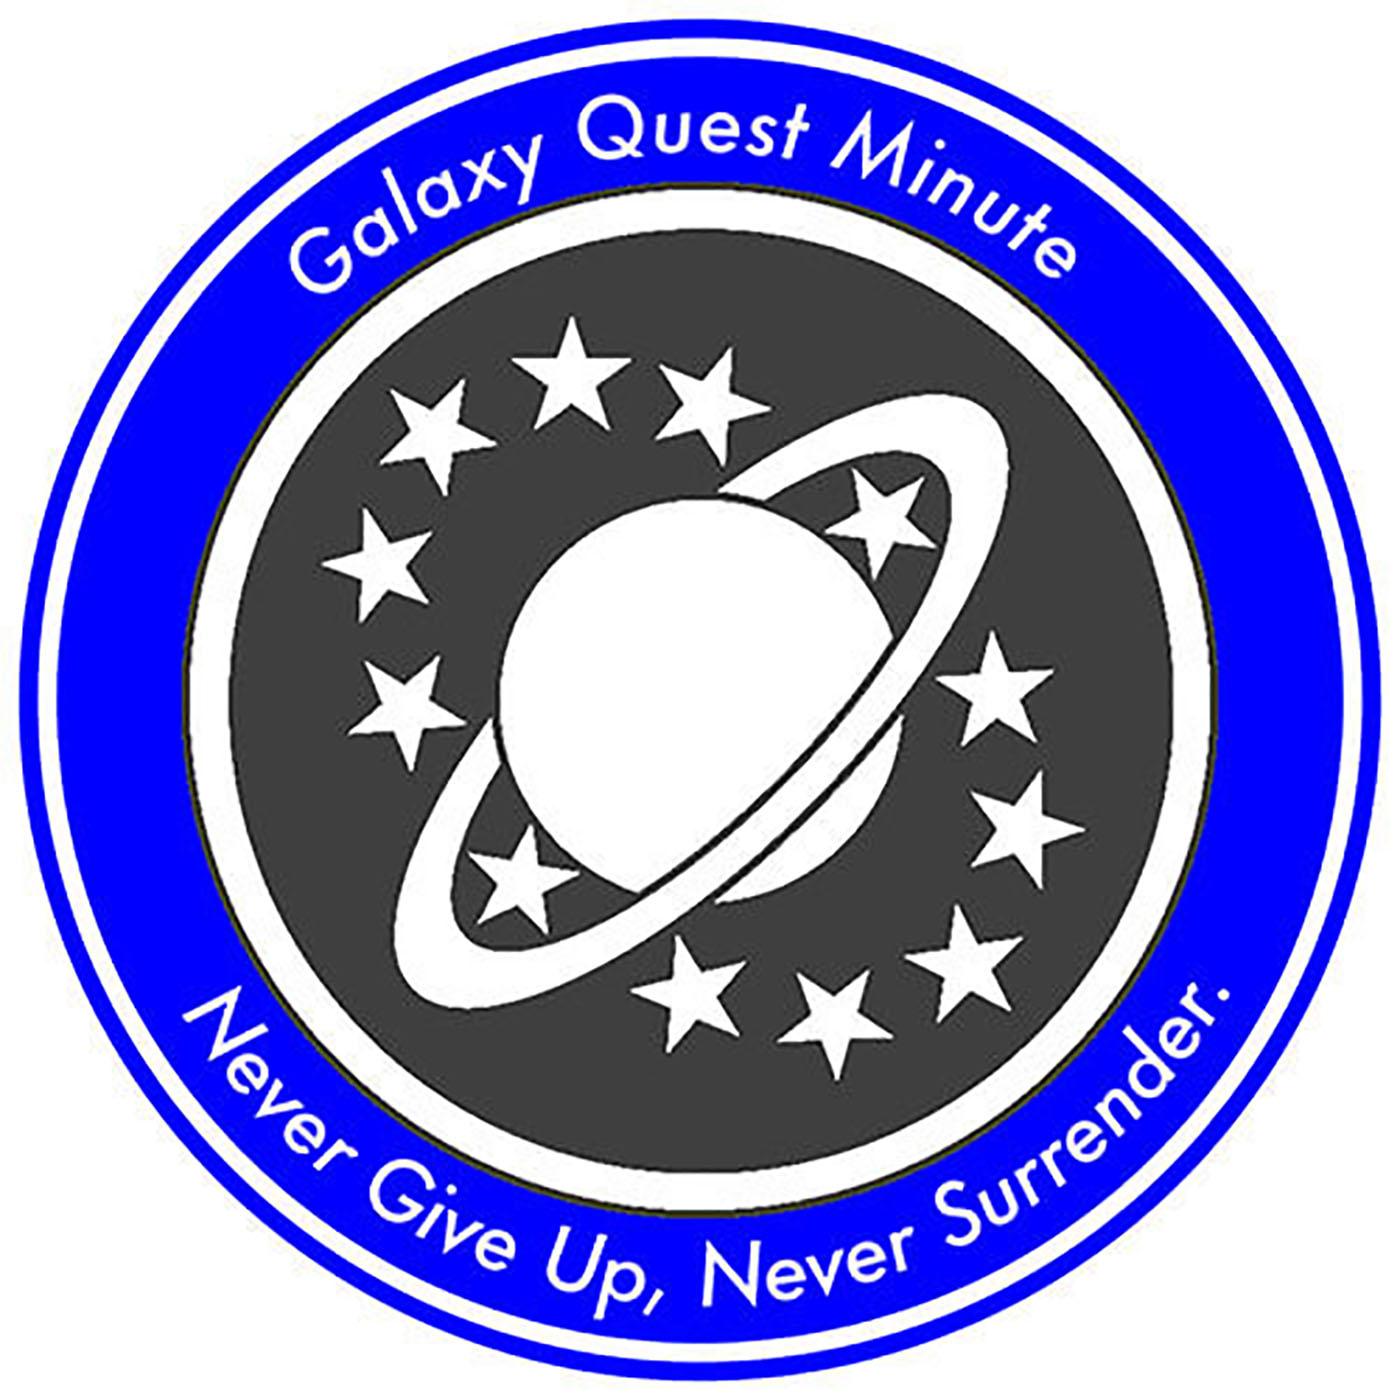 Galaxy Quest Minute